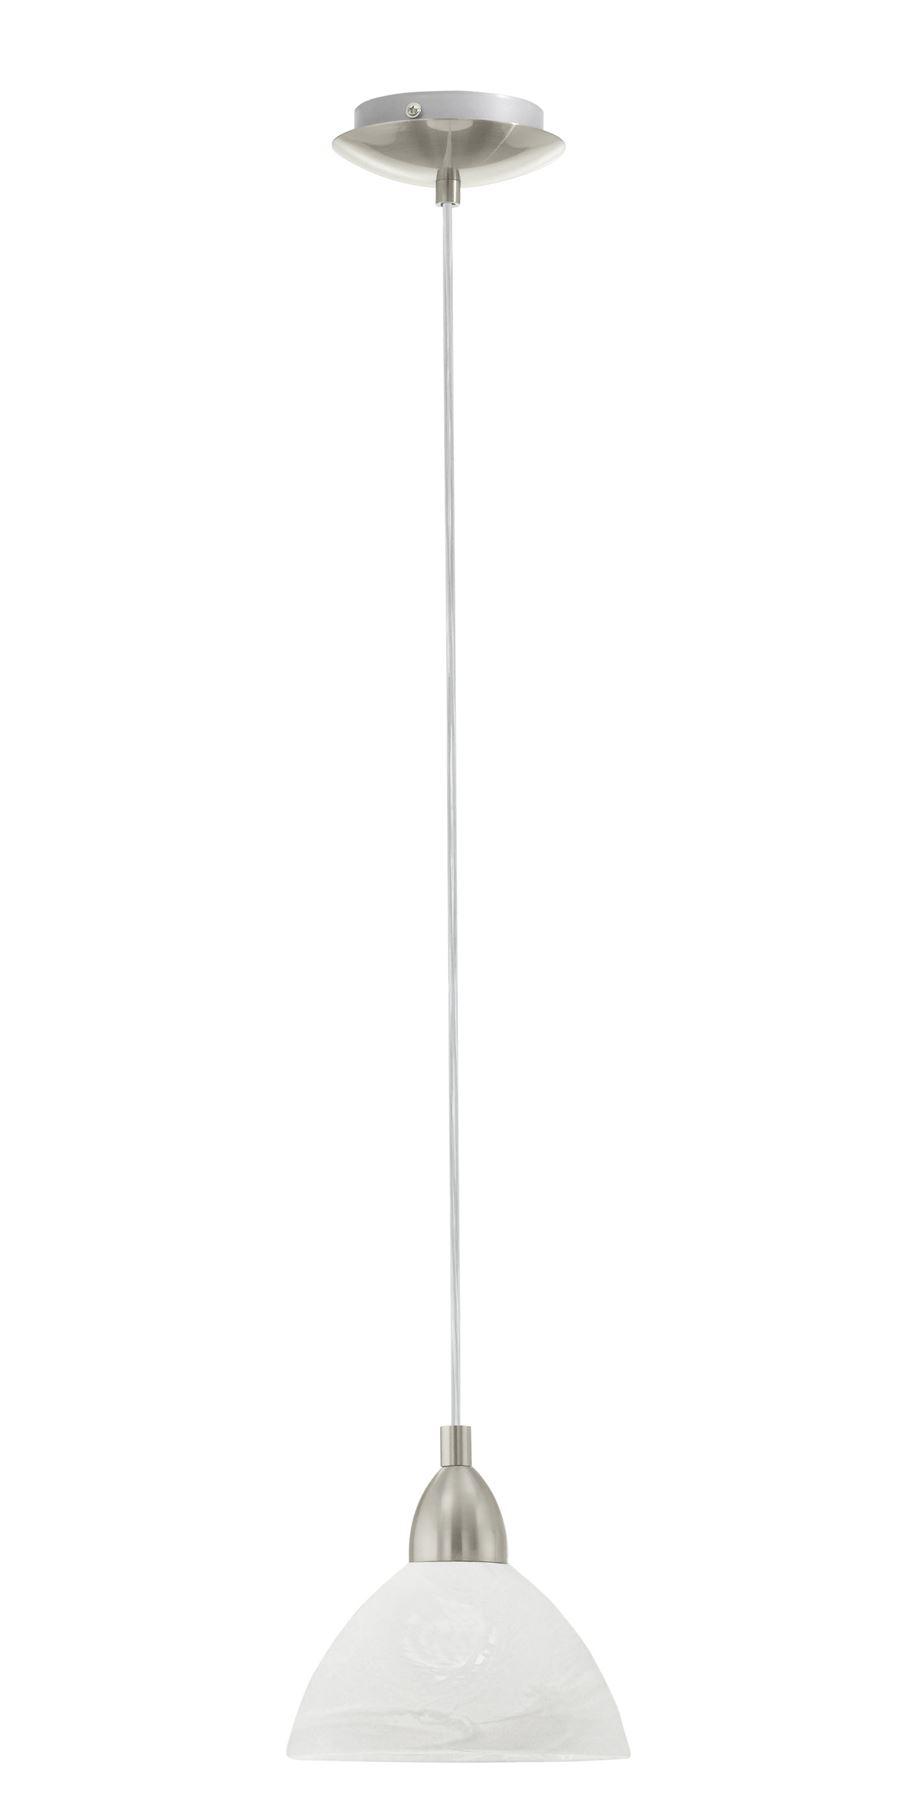 Brenda 1 Hanging Light E27 Alabaster Glass White Shade